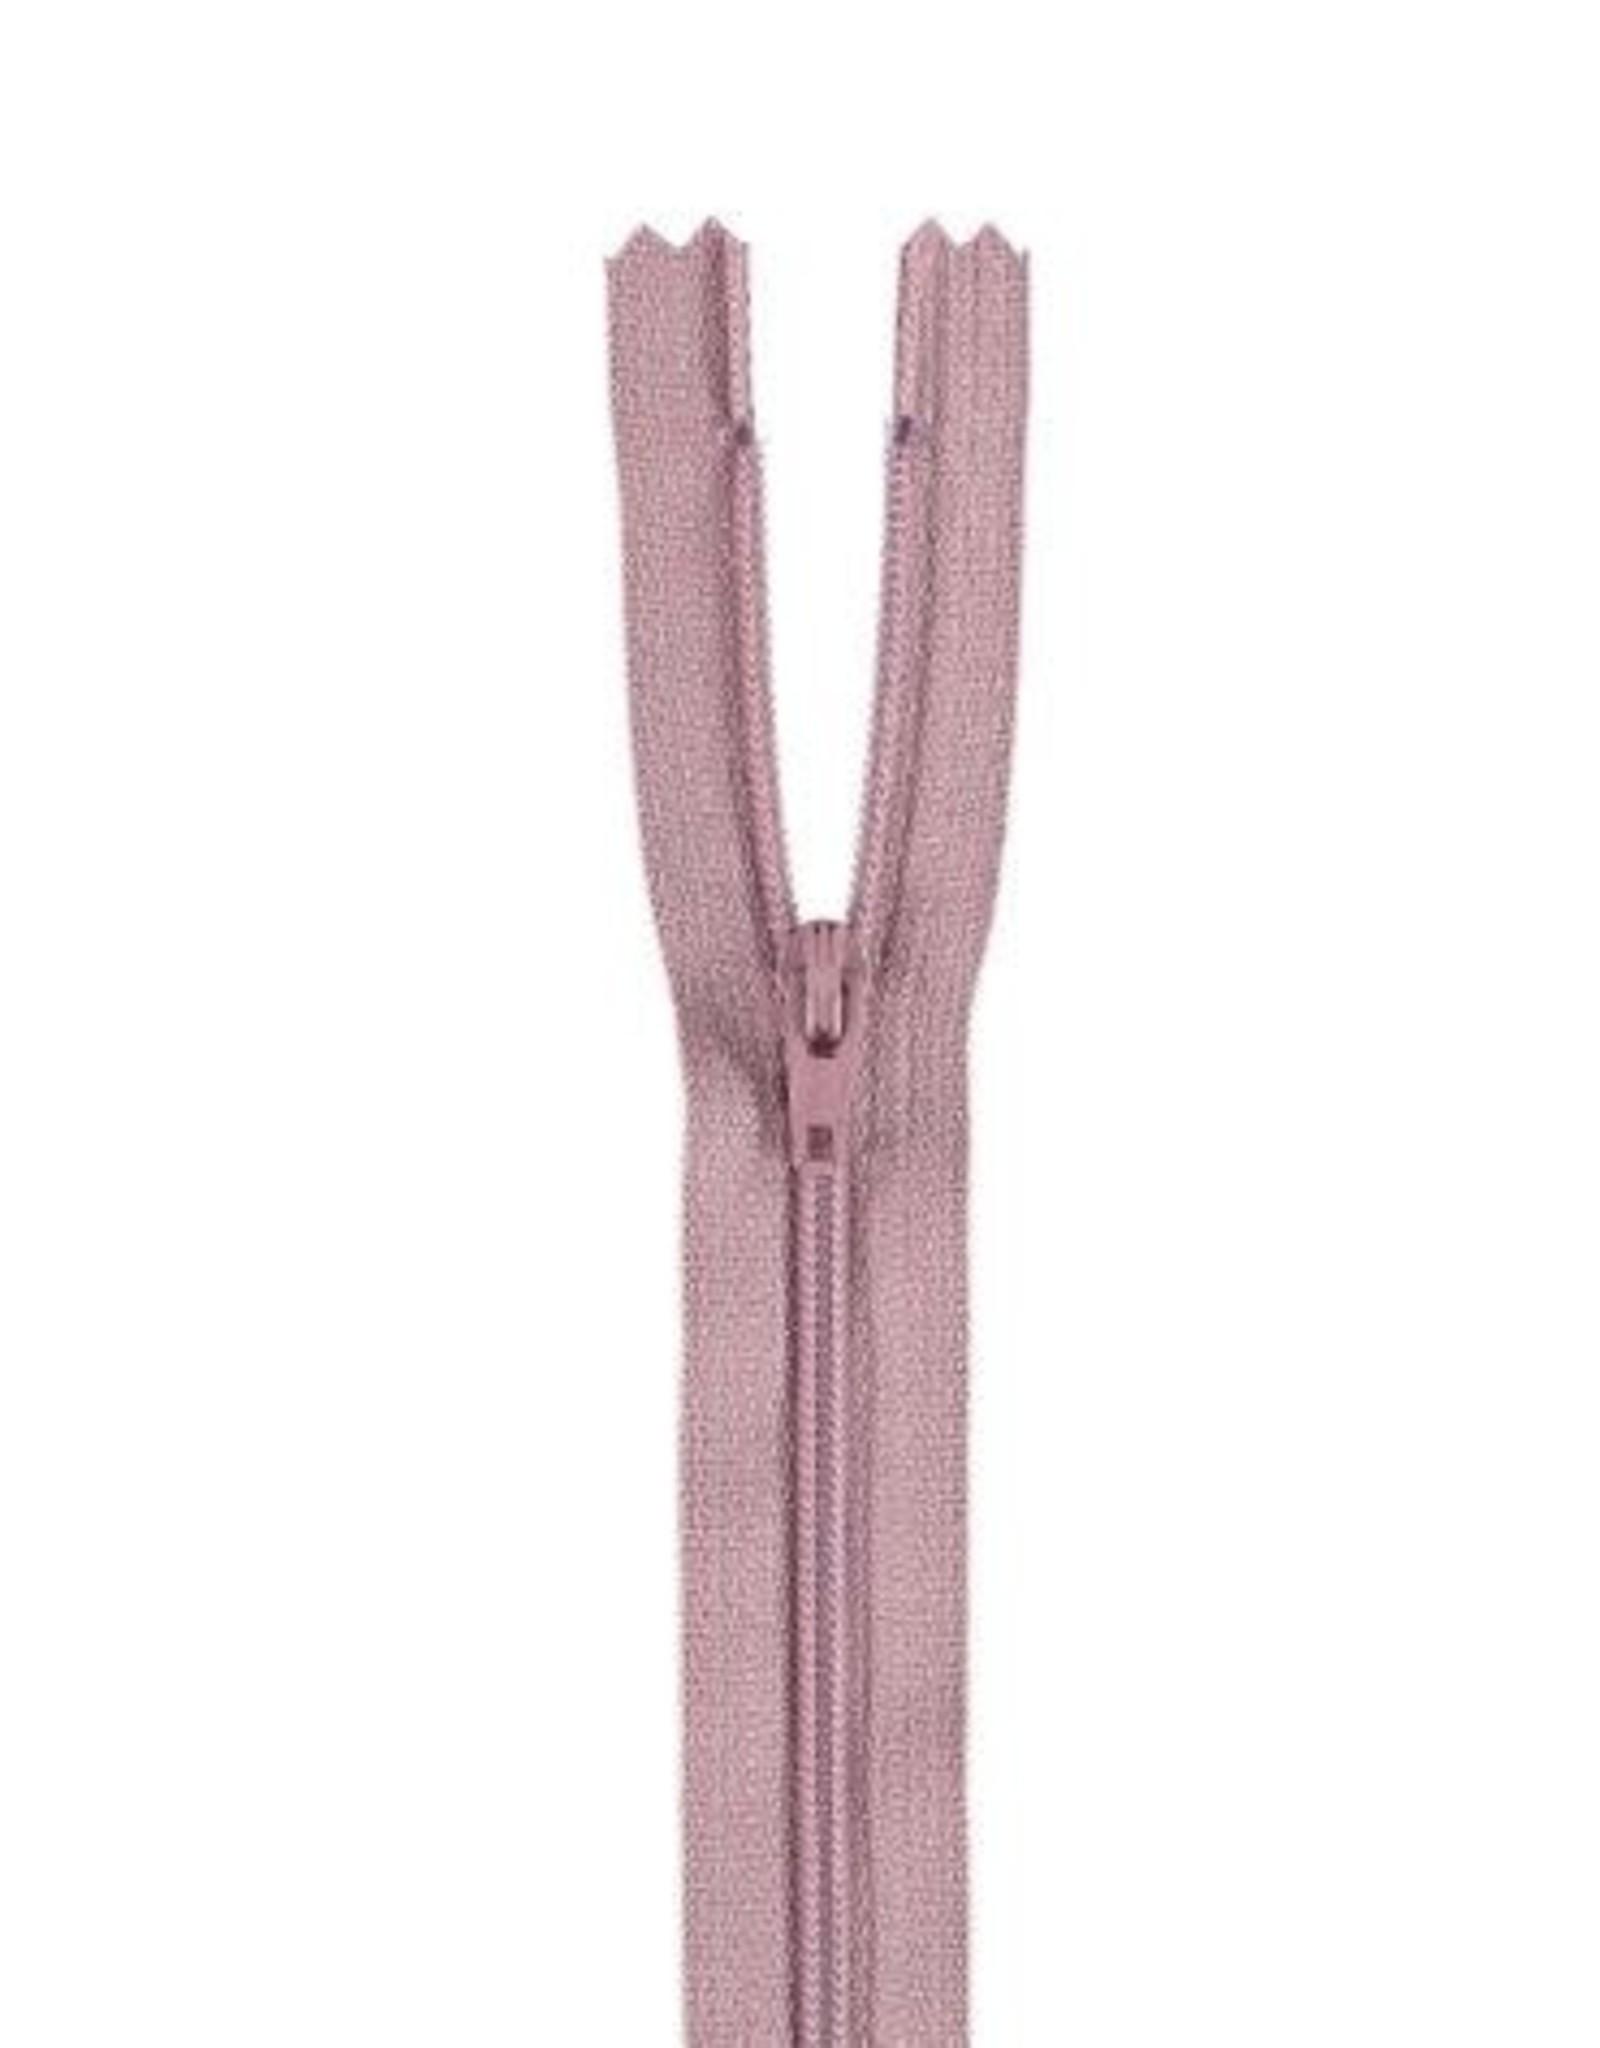 YKK Spiraalrits niet-DB 3mm oud roze 069-22cm